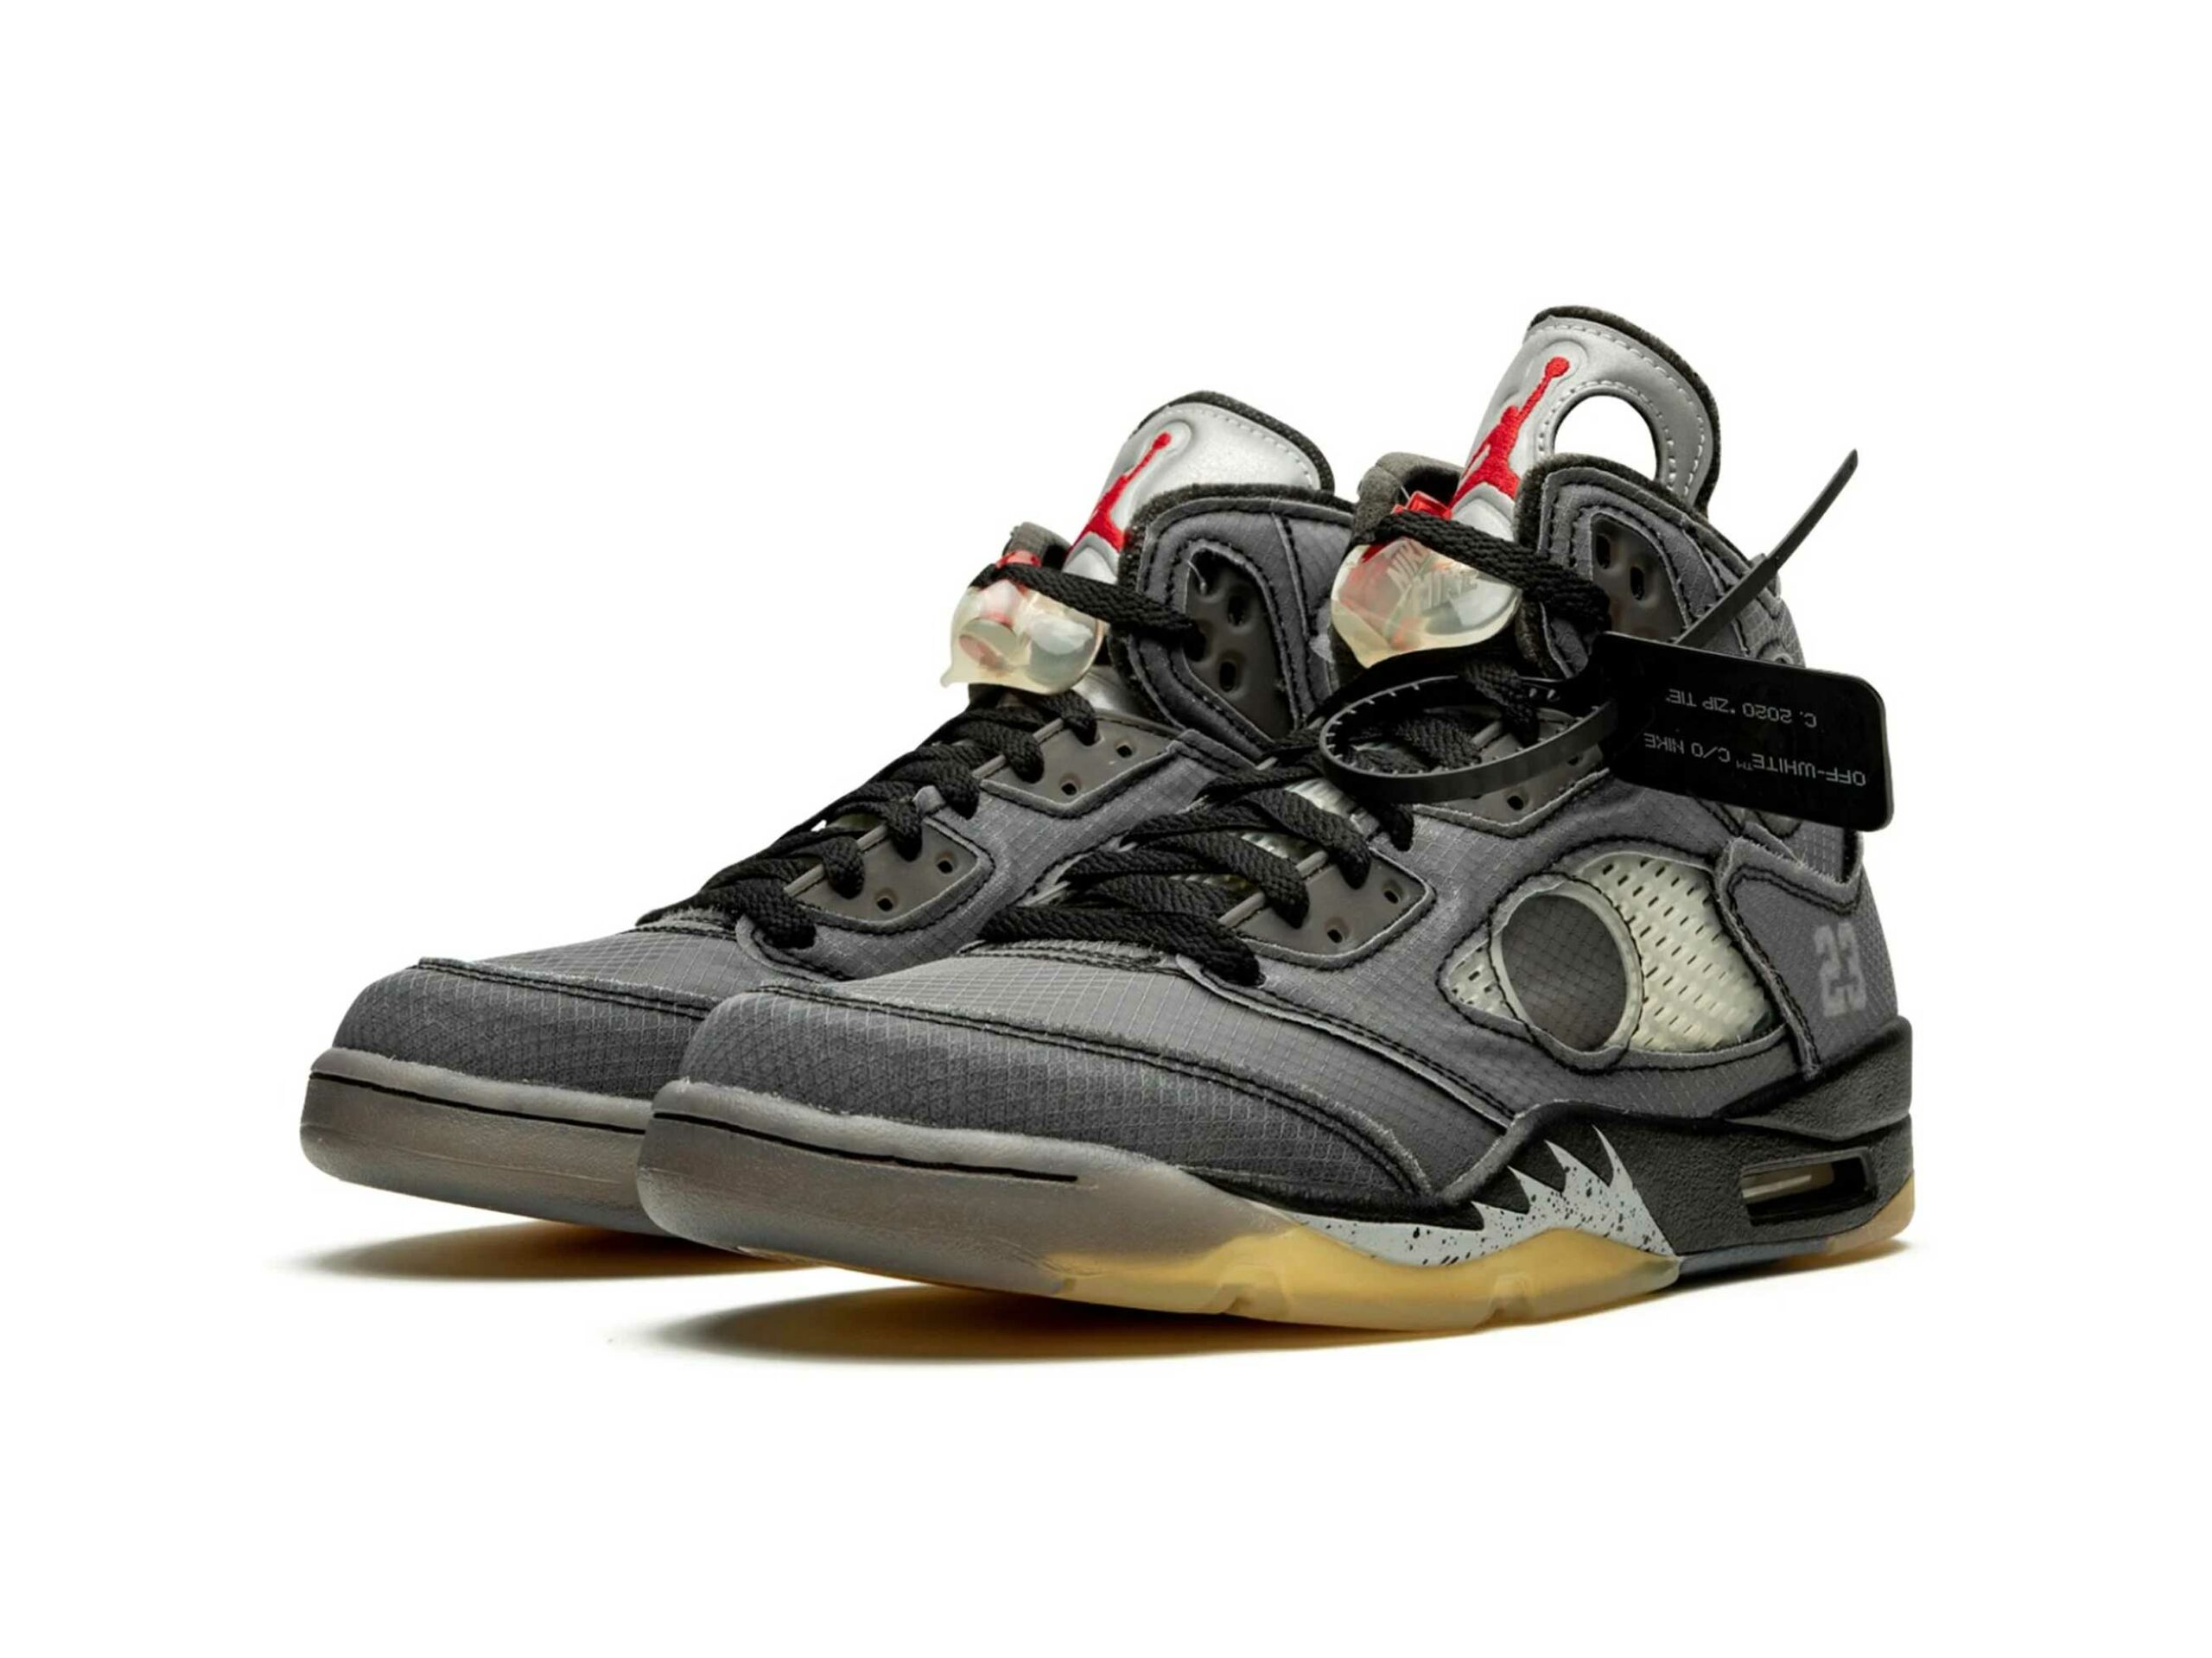 nike x off-white air Jordan 5 retro black CT8480_001 купить